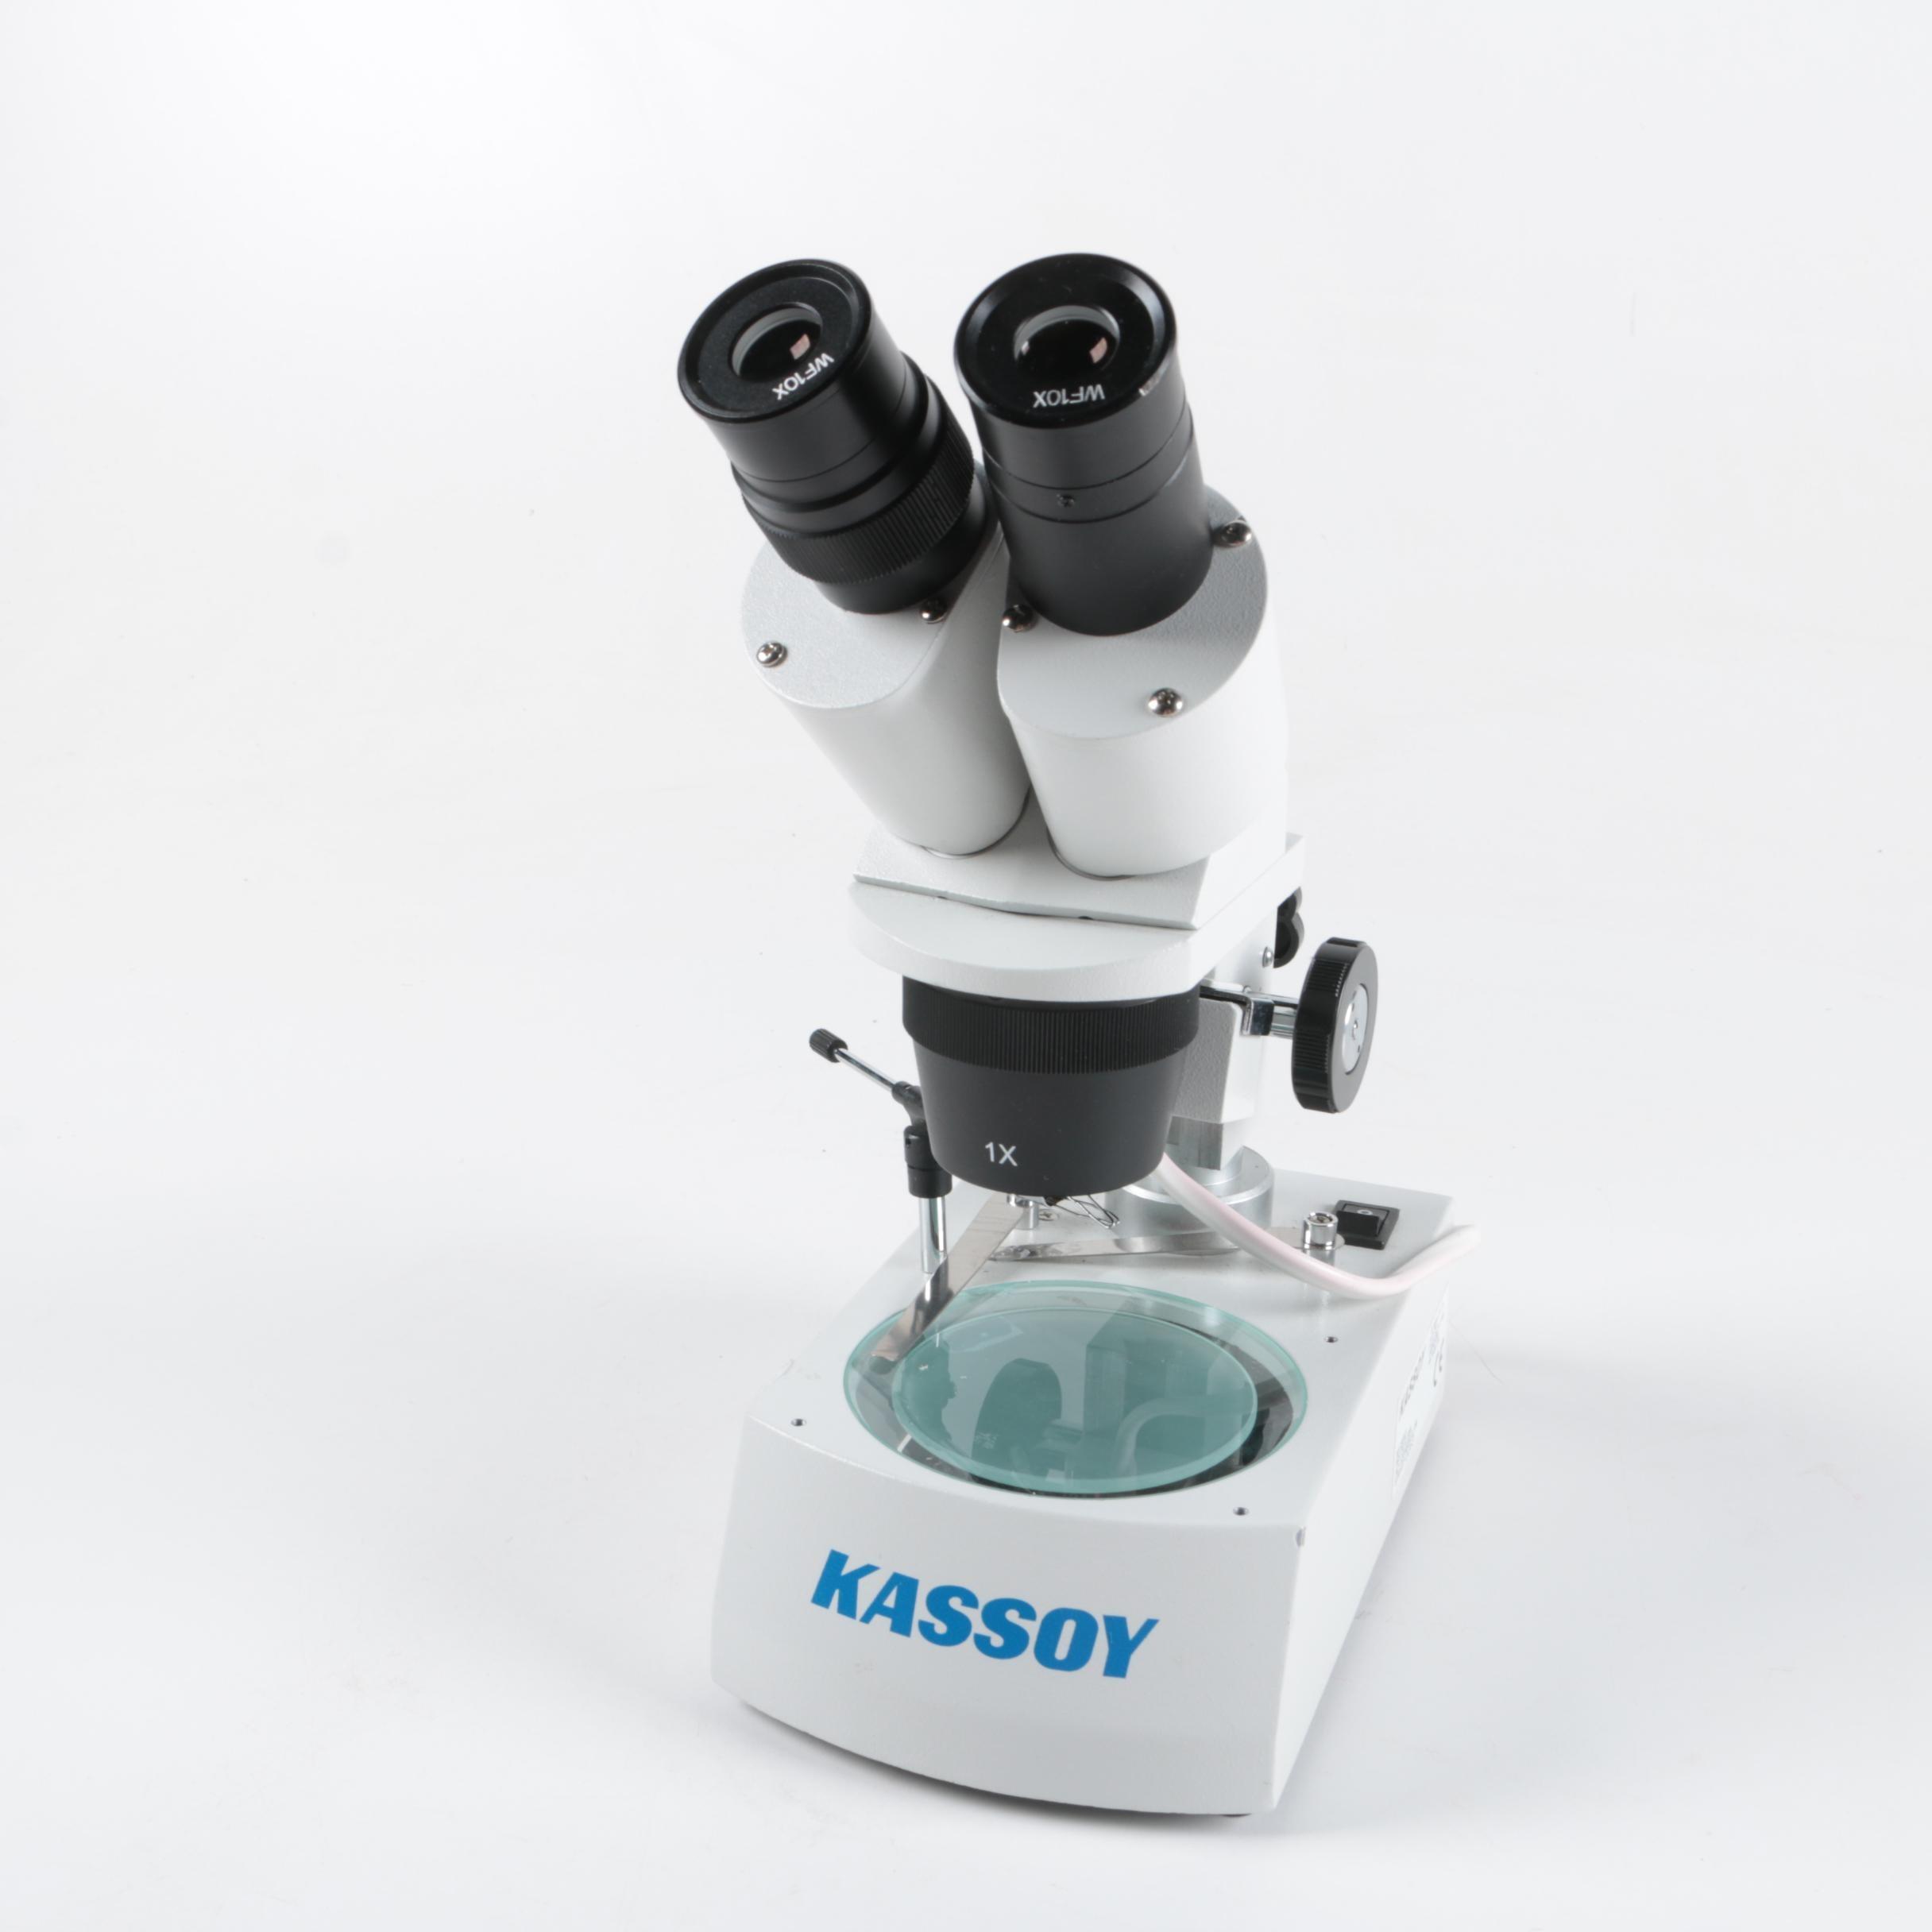 Kassoy Gemological Microscope